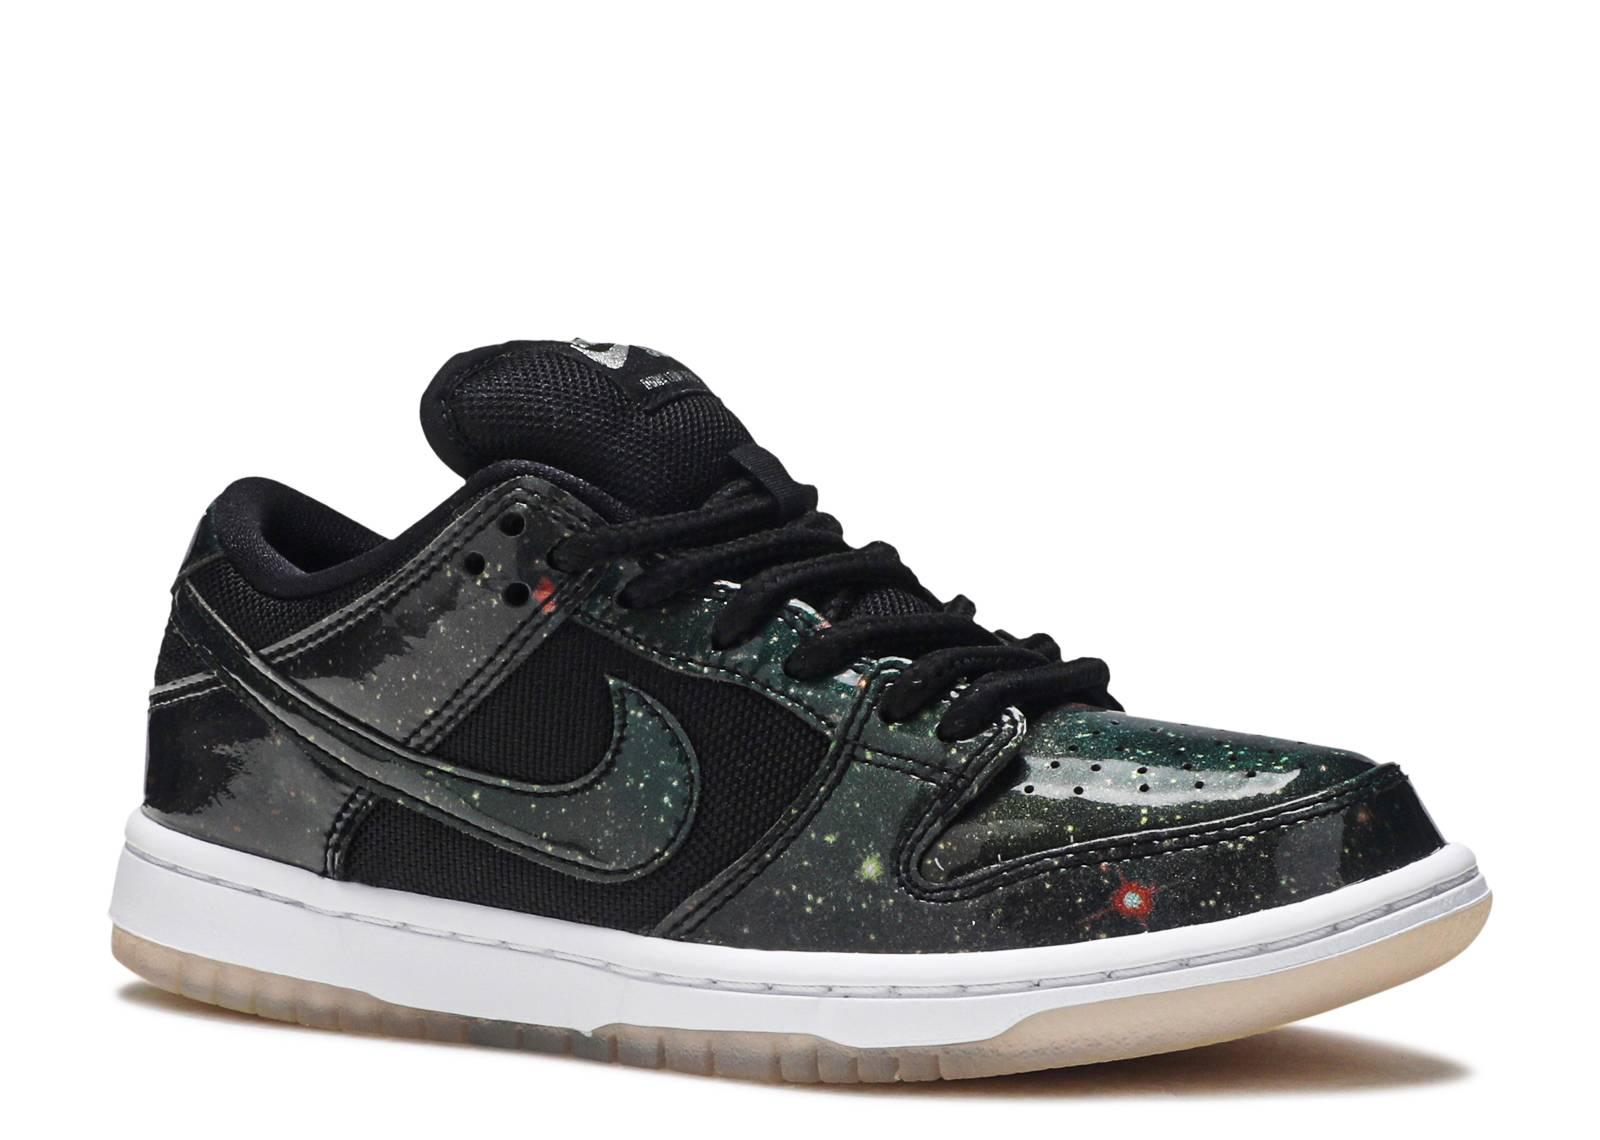 promo code 7612b 58db4 Nike Sb Dunk Low Trd Qs